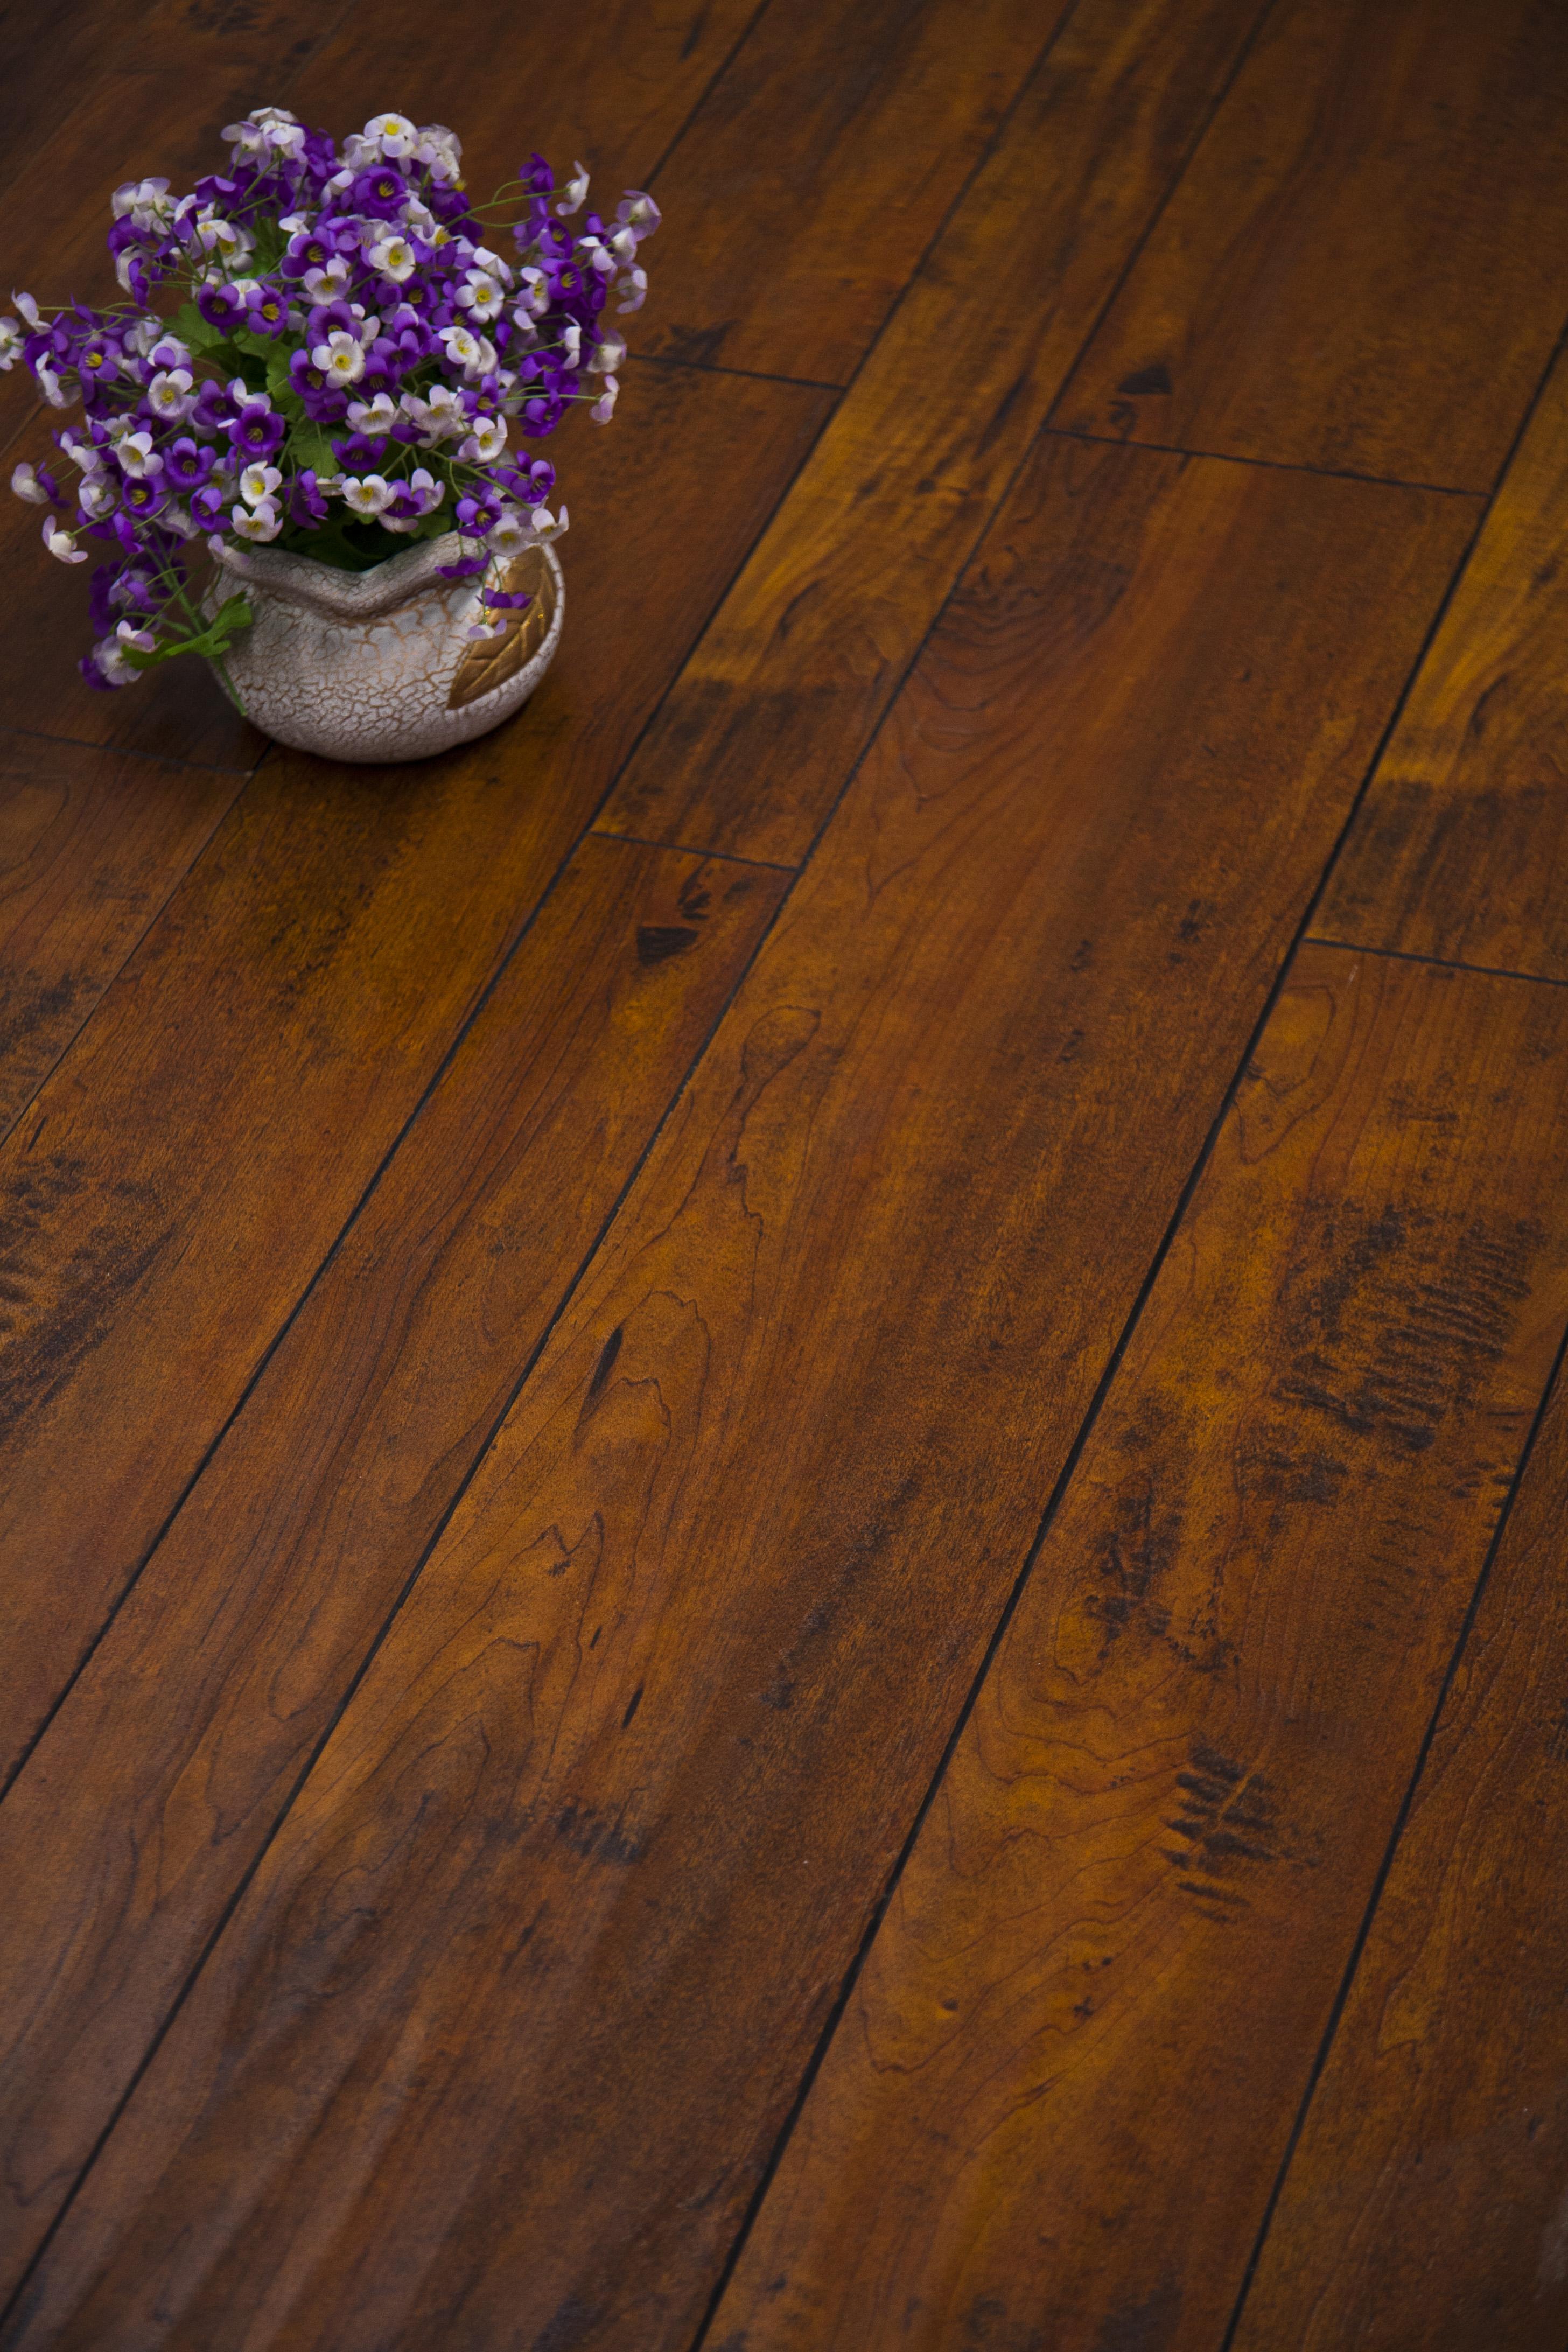 Expert Hardwood Flooring expert hardwood flooring ontario ca us 91761 Quality Expert Hardwood Flooring Service